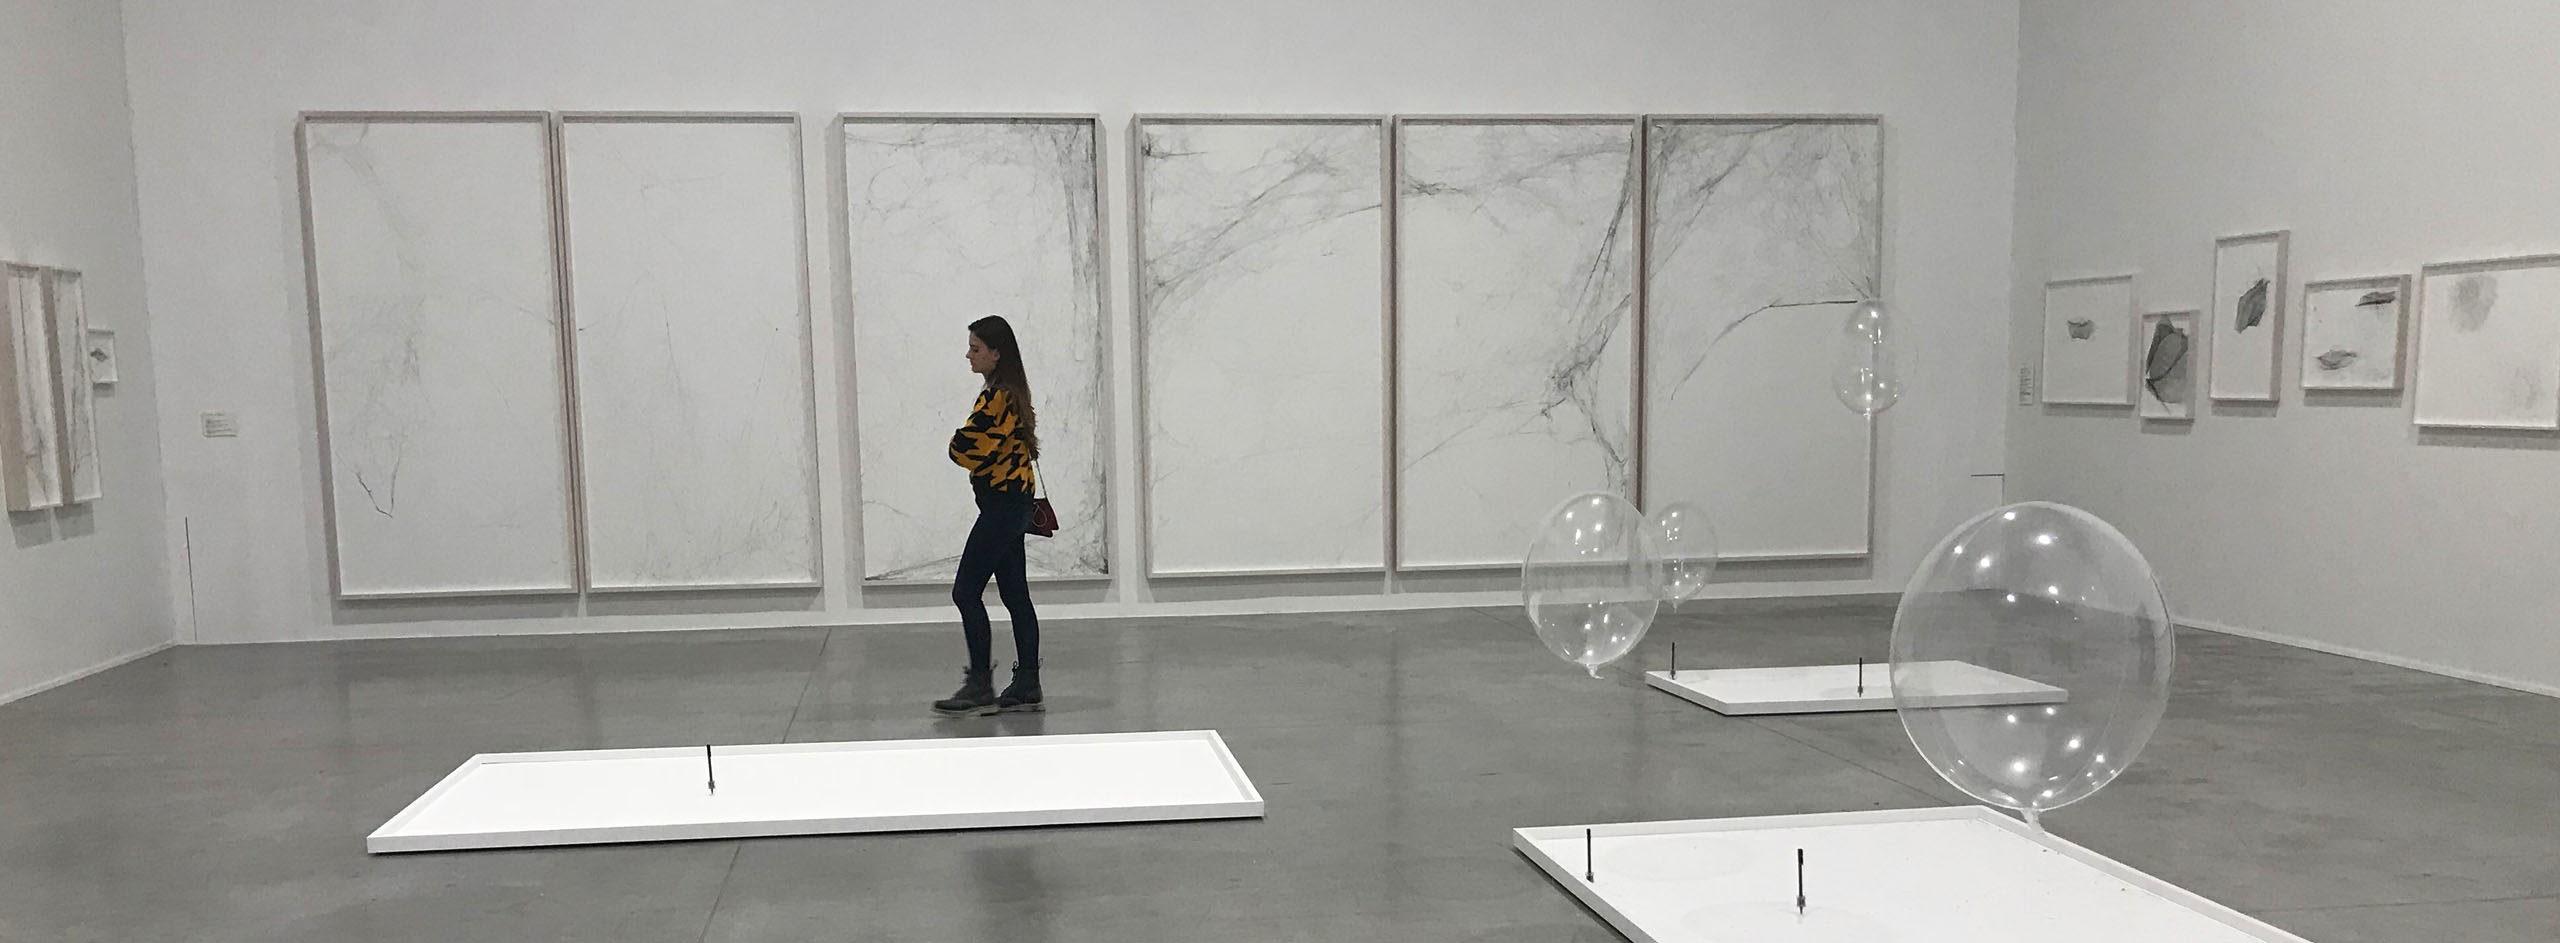 Exposition ON AIR, Tomás Saraceno au Palais de Tokyo